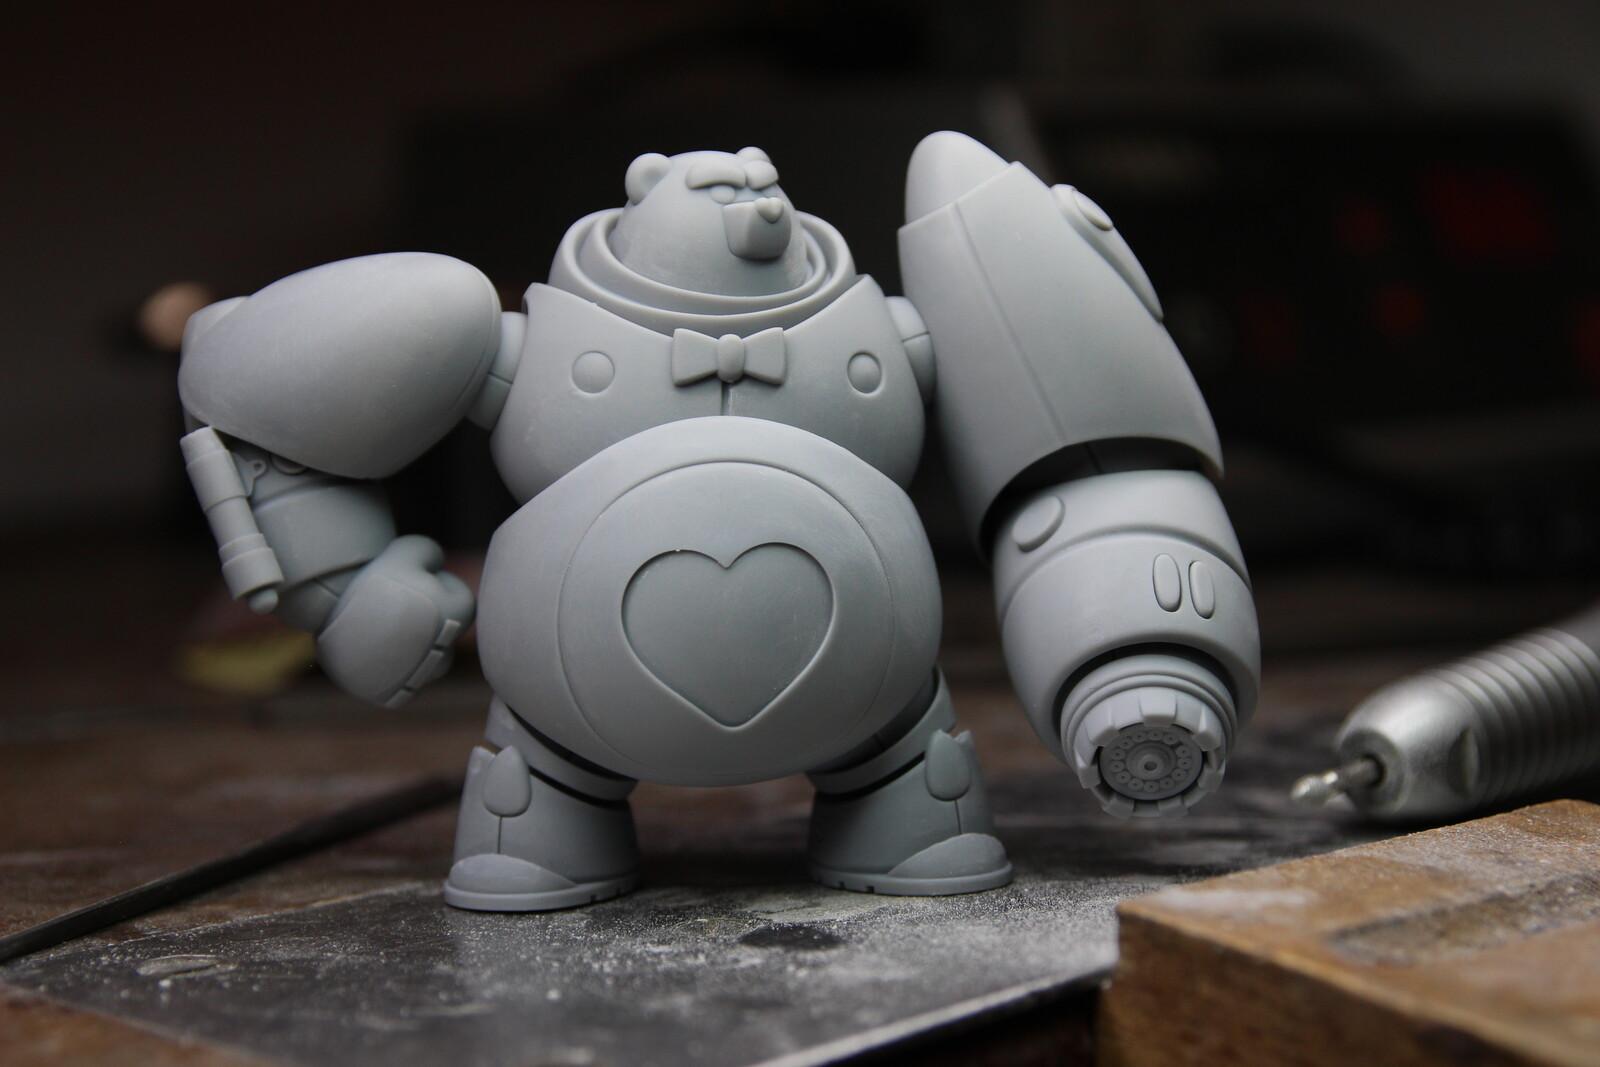 3D Printed Miniature